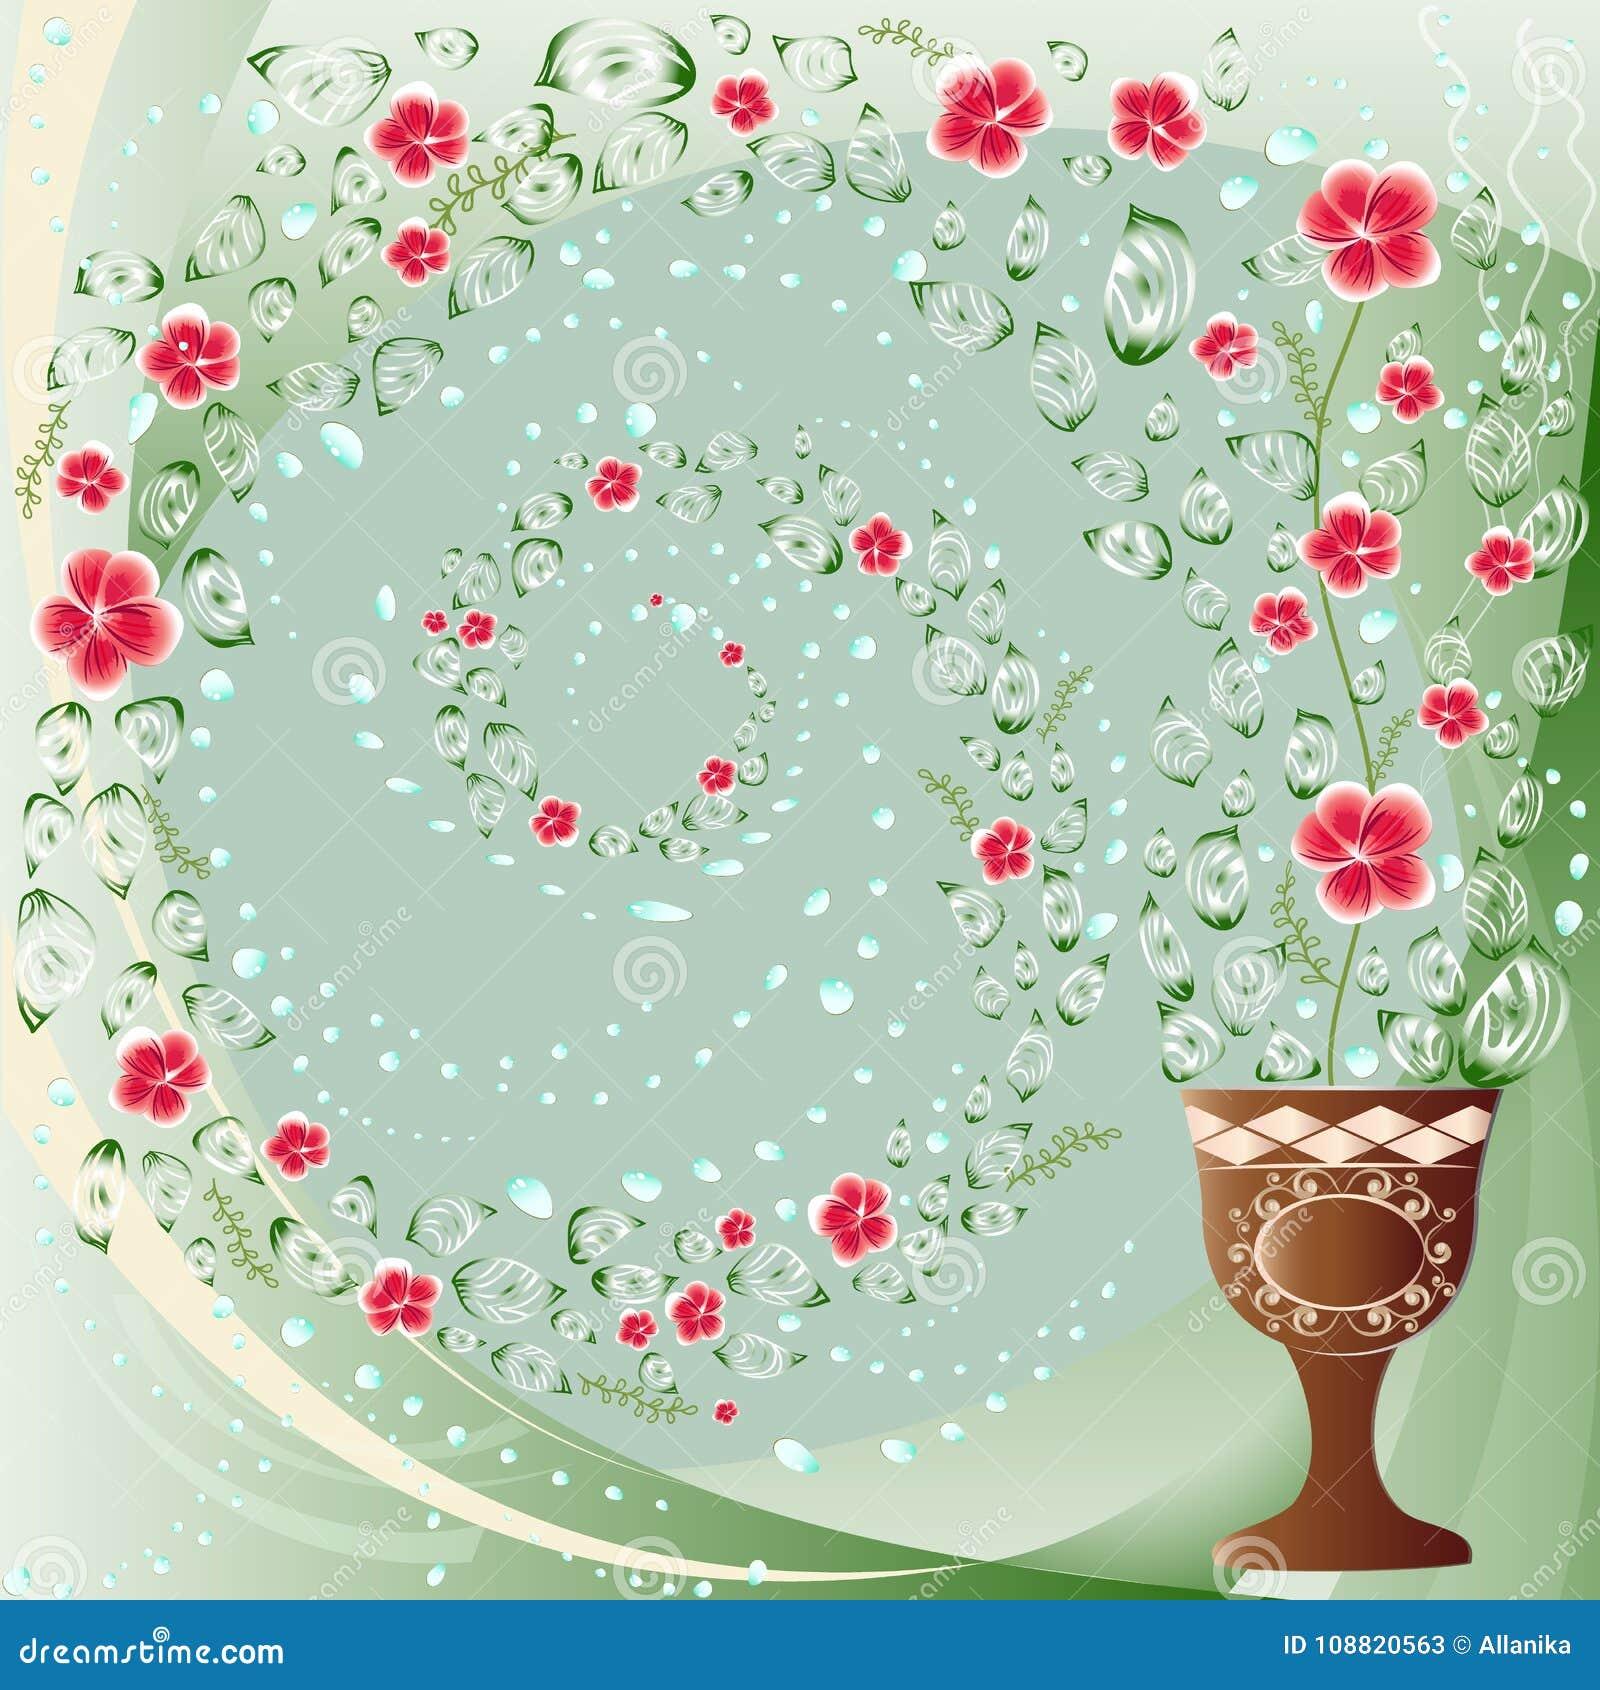 Flower whirlpool background